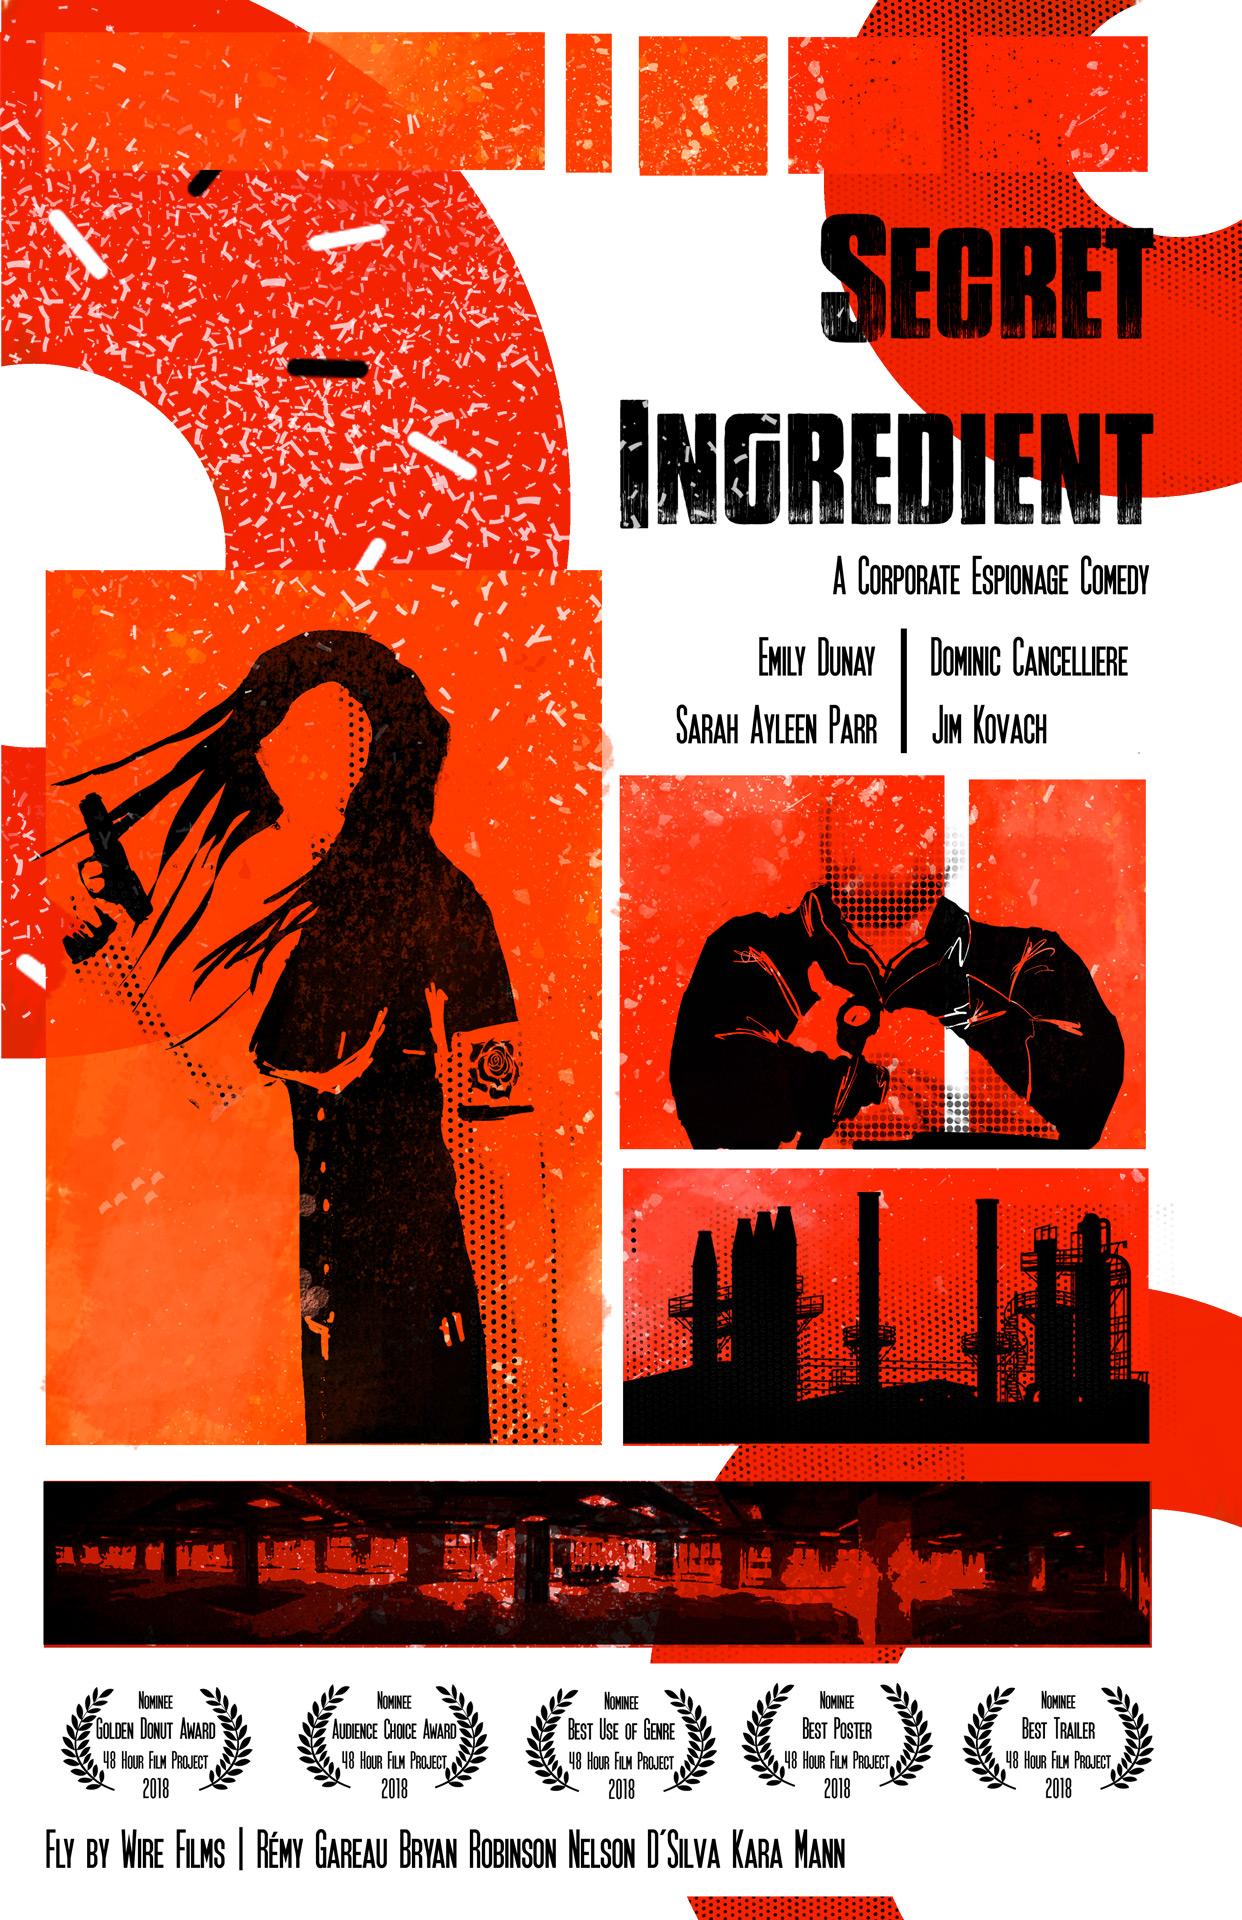 Secret-Ingredient-Poster-48-Laurels-FINAL.jpg